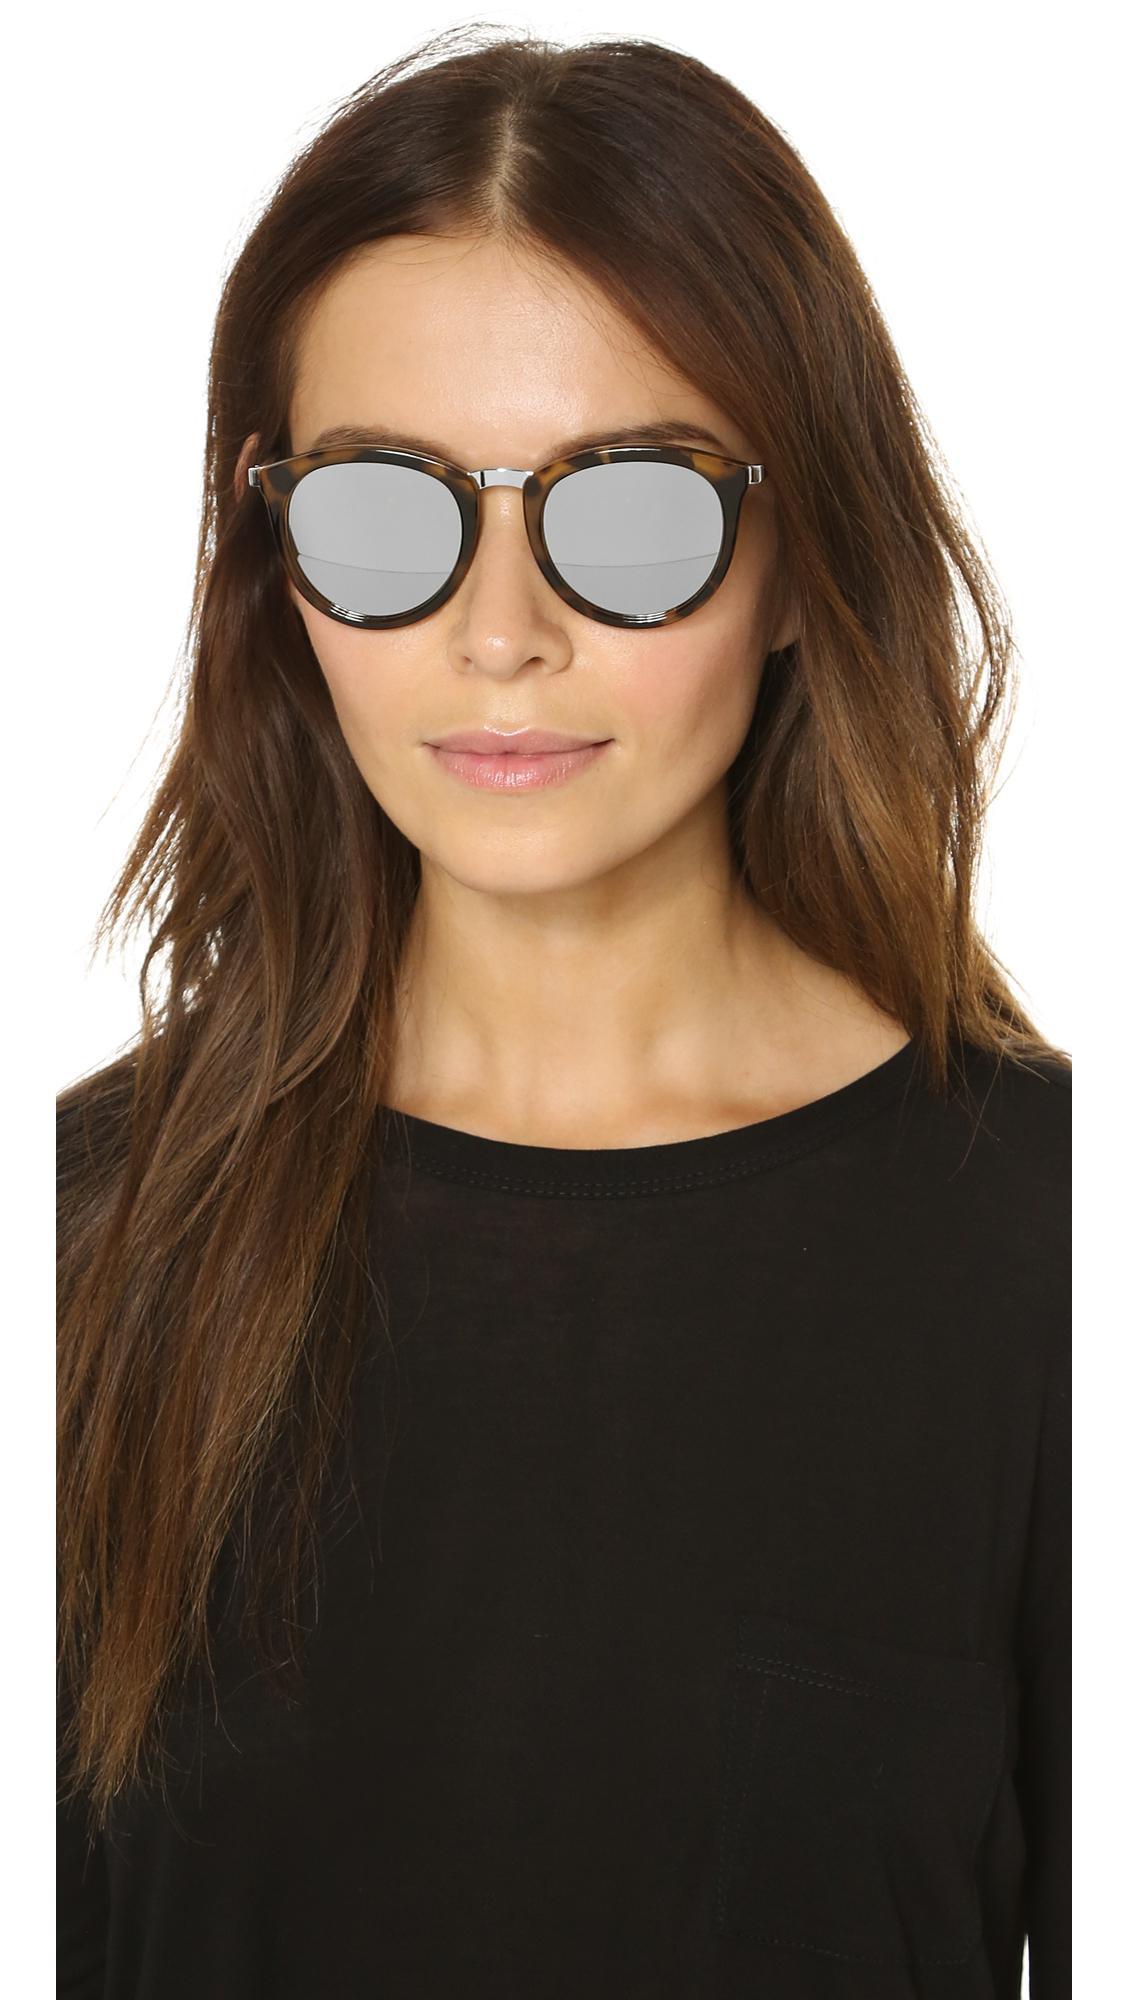 db5c84ce9a4 Le Specs - Metallic No Smirking Sunglasses - Lyst. View fullscreen